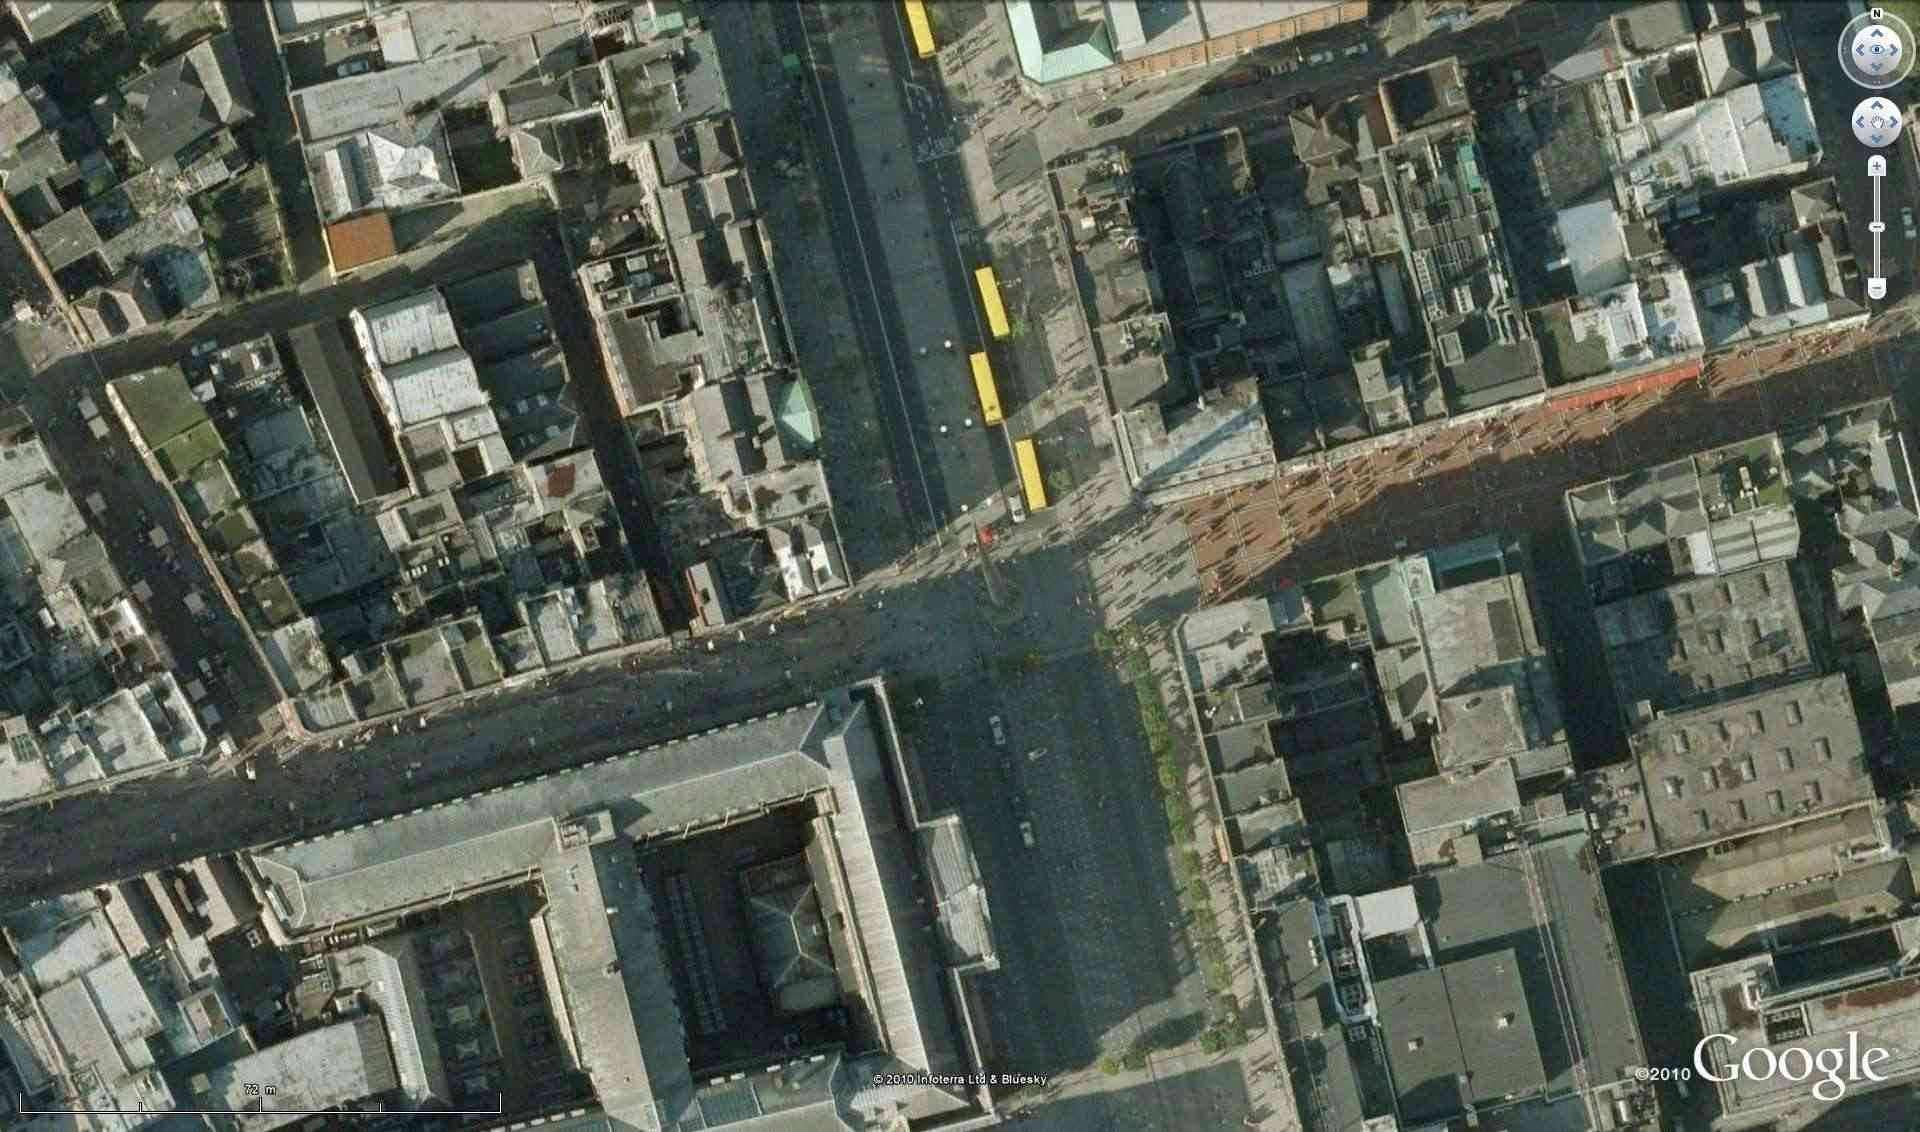 "The Spire of Dublin, Dublin, Irlande, 53°20'59.21""N 6°15'36.98""W [Défi trouvé] Defi_d10"